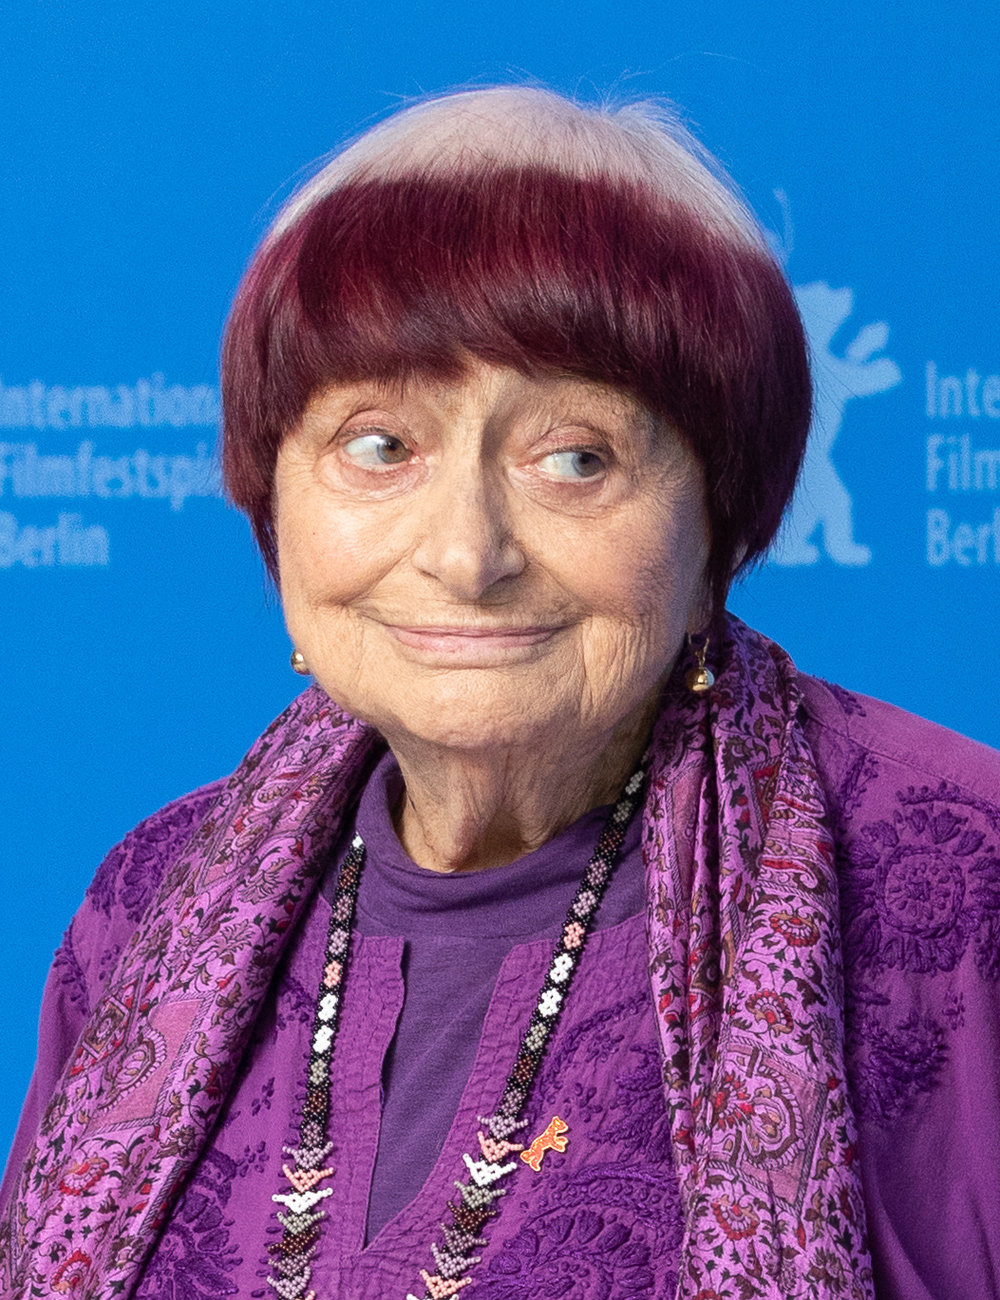 Varda at the Berlinale, February 2019. Courtesy of Wikipedia